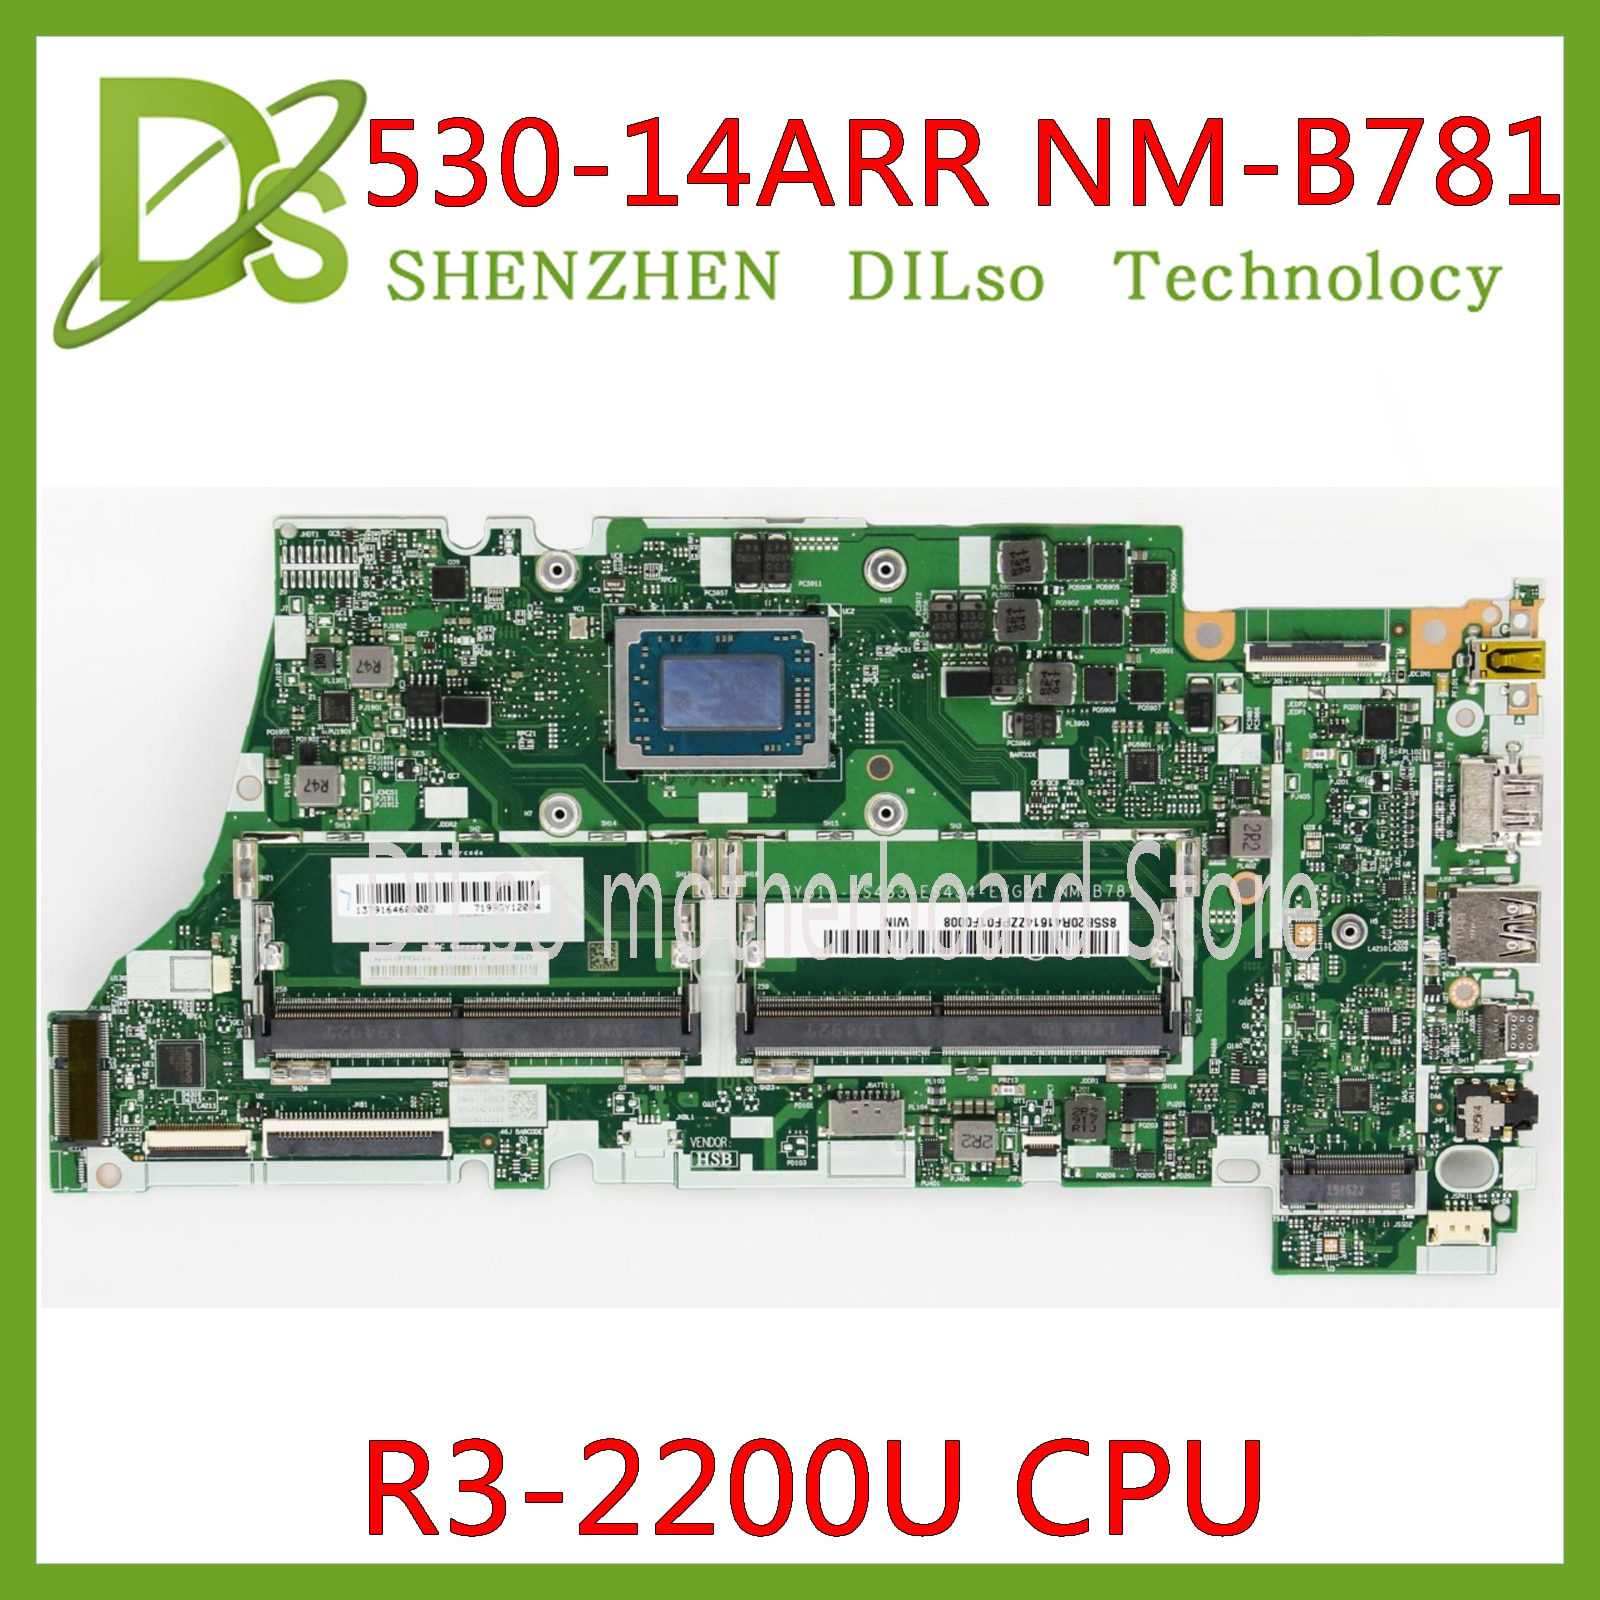 KEFU NM-B781 اللوحة لينوفو Xiaoxin الهواء اليوغا 530-14ARR اللوحة الرئيسية Ryzen 3 2200 وحدة المعالجة المركزية DDR4 اللوحة الأم